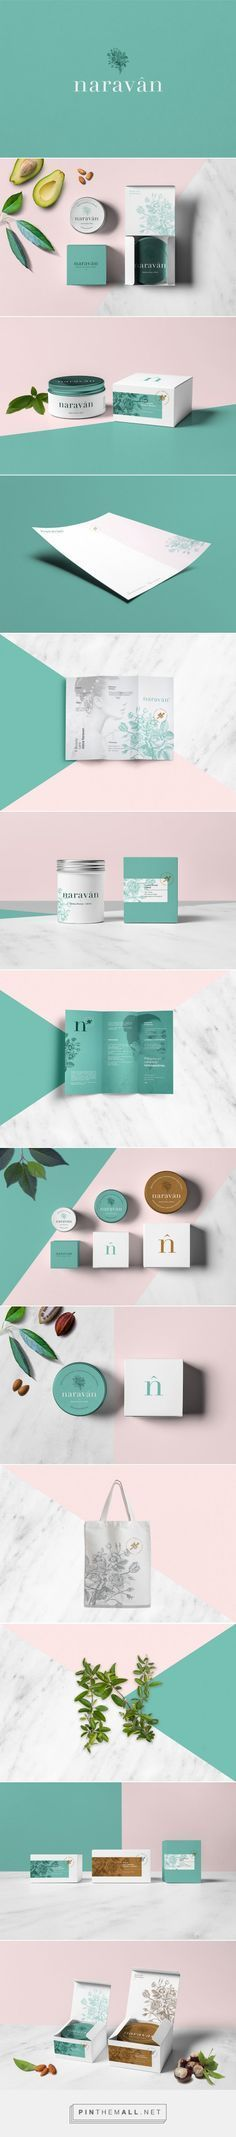 Naraván beauty packaging designed by Para